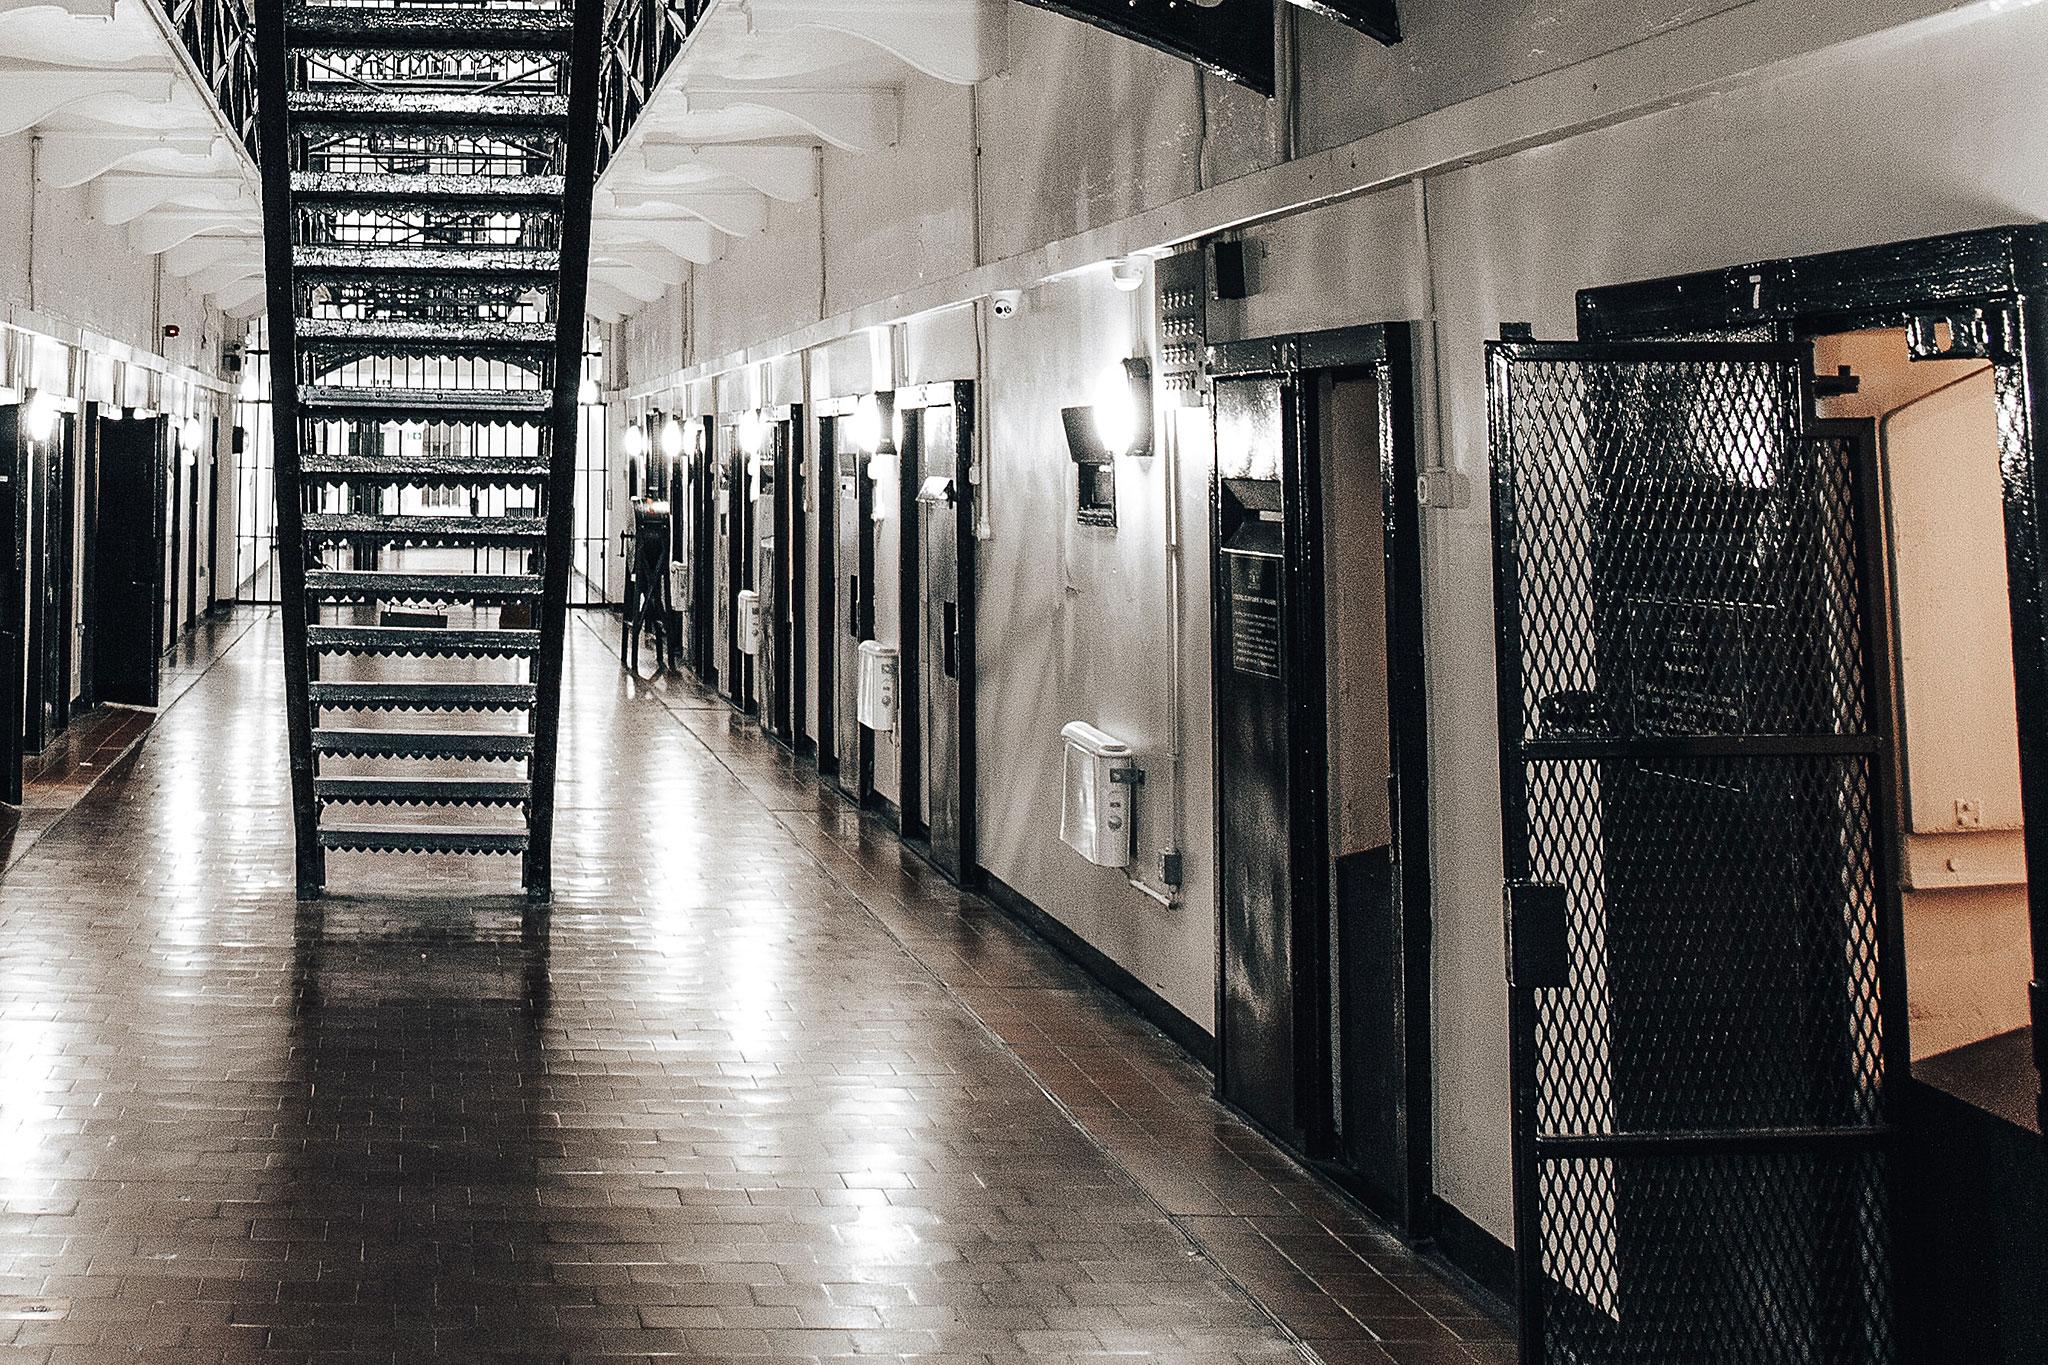 Gefängnisflur